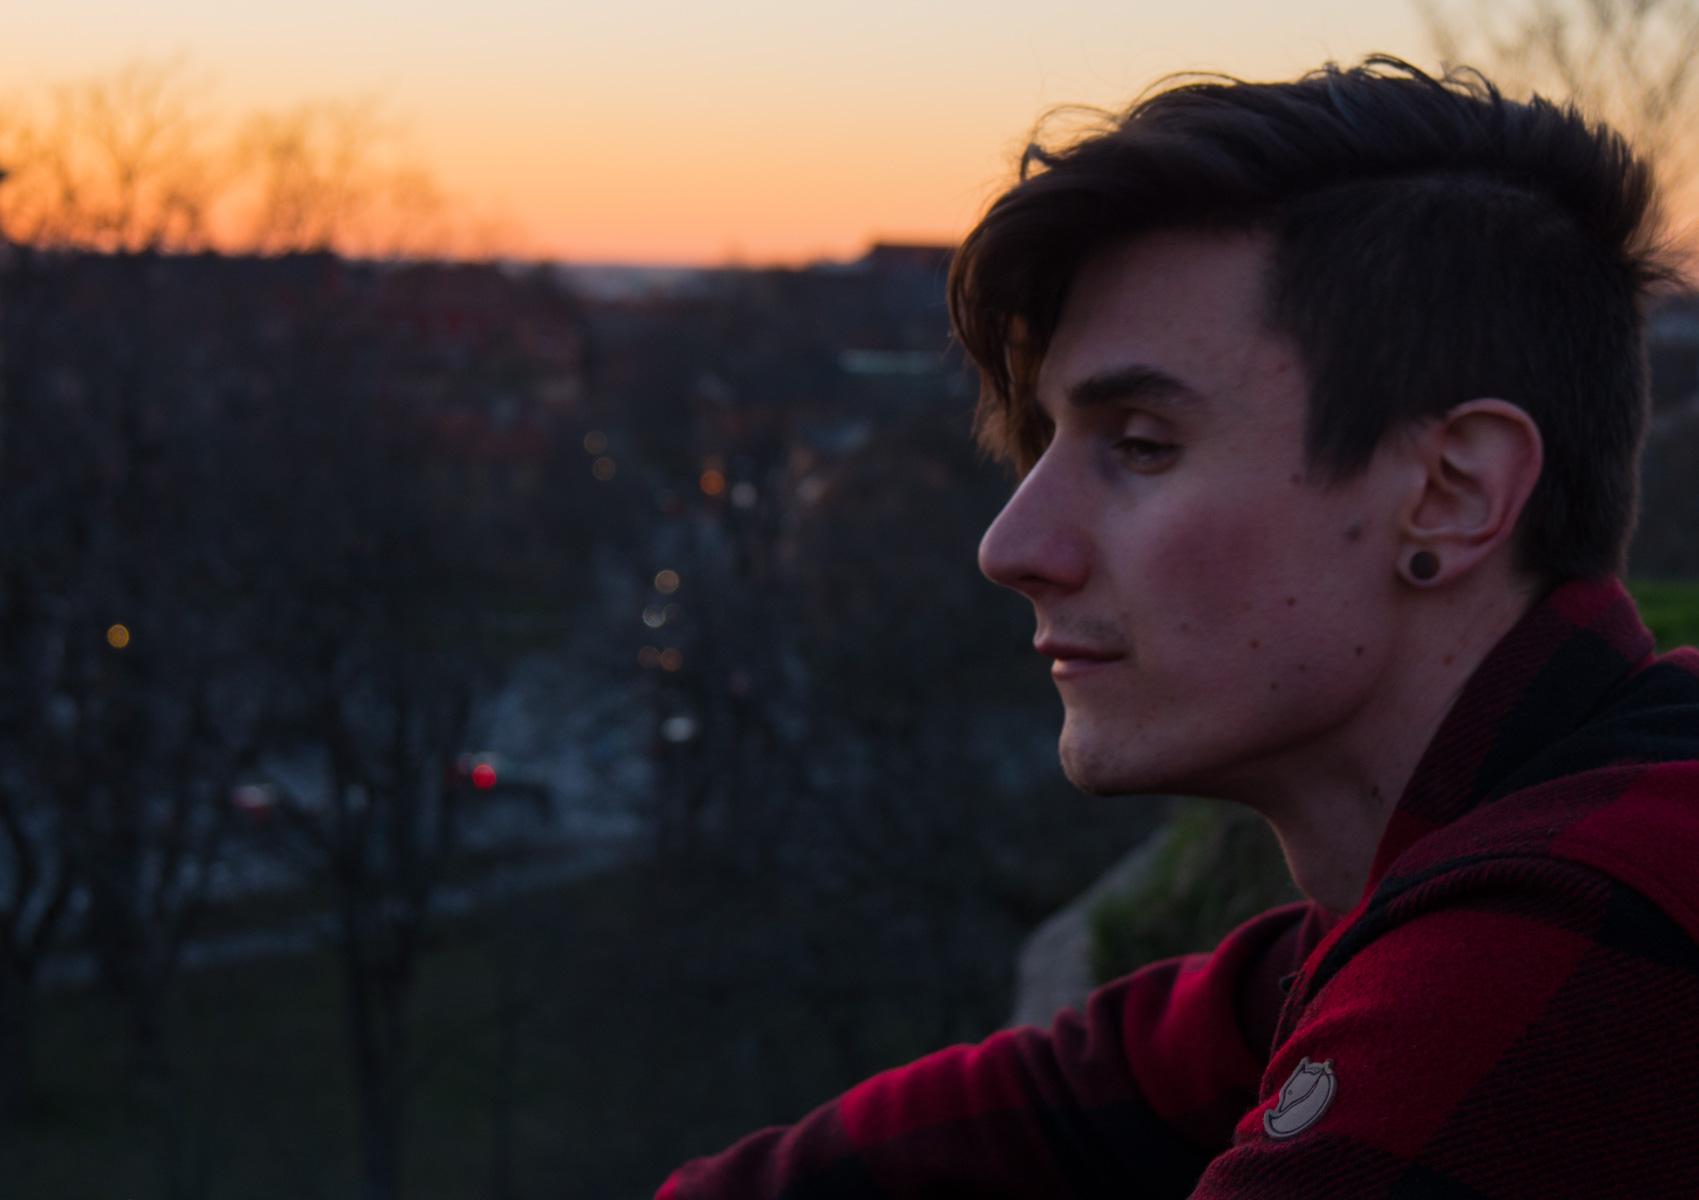 Erik in the sunset